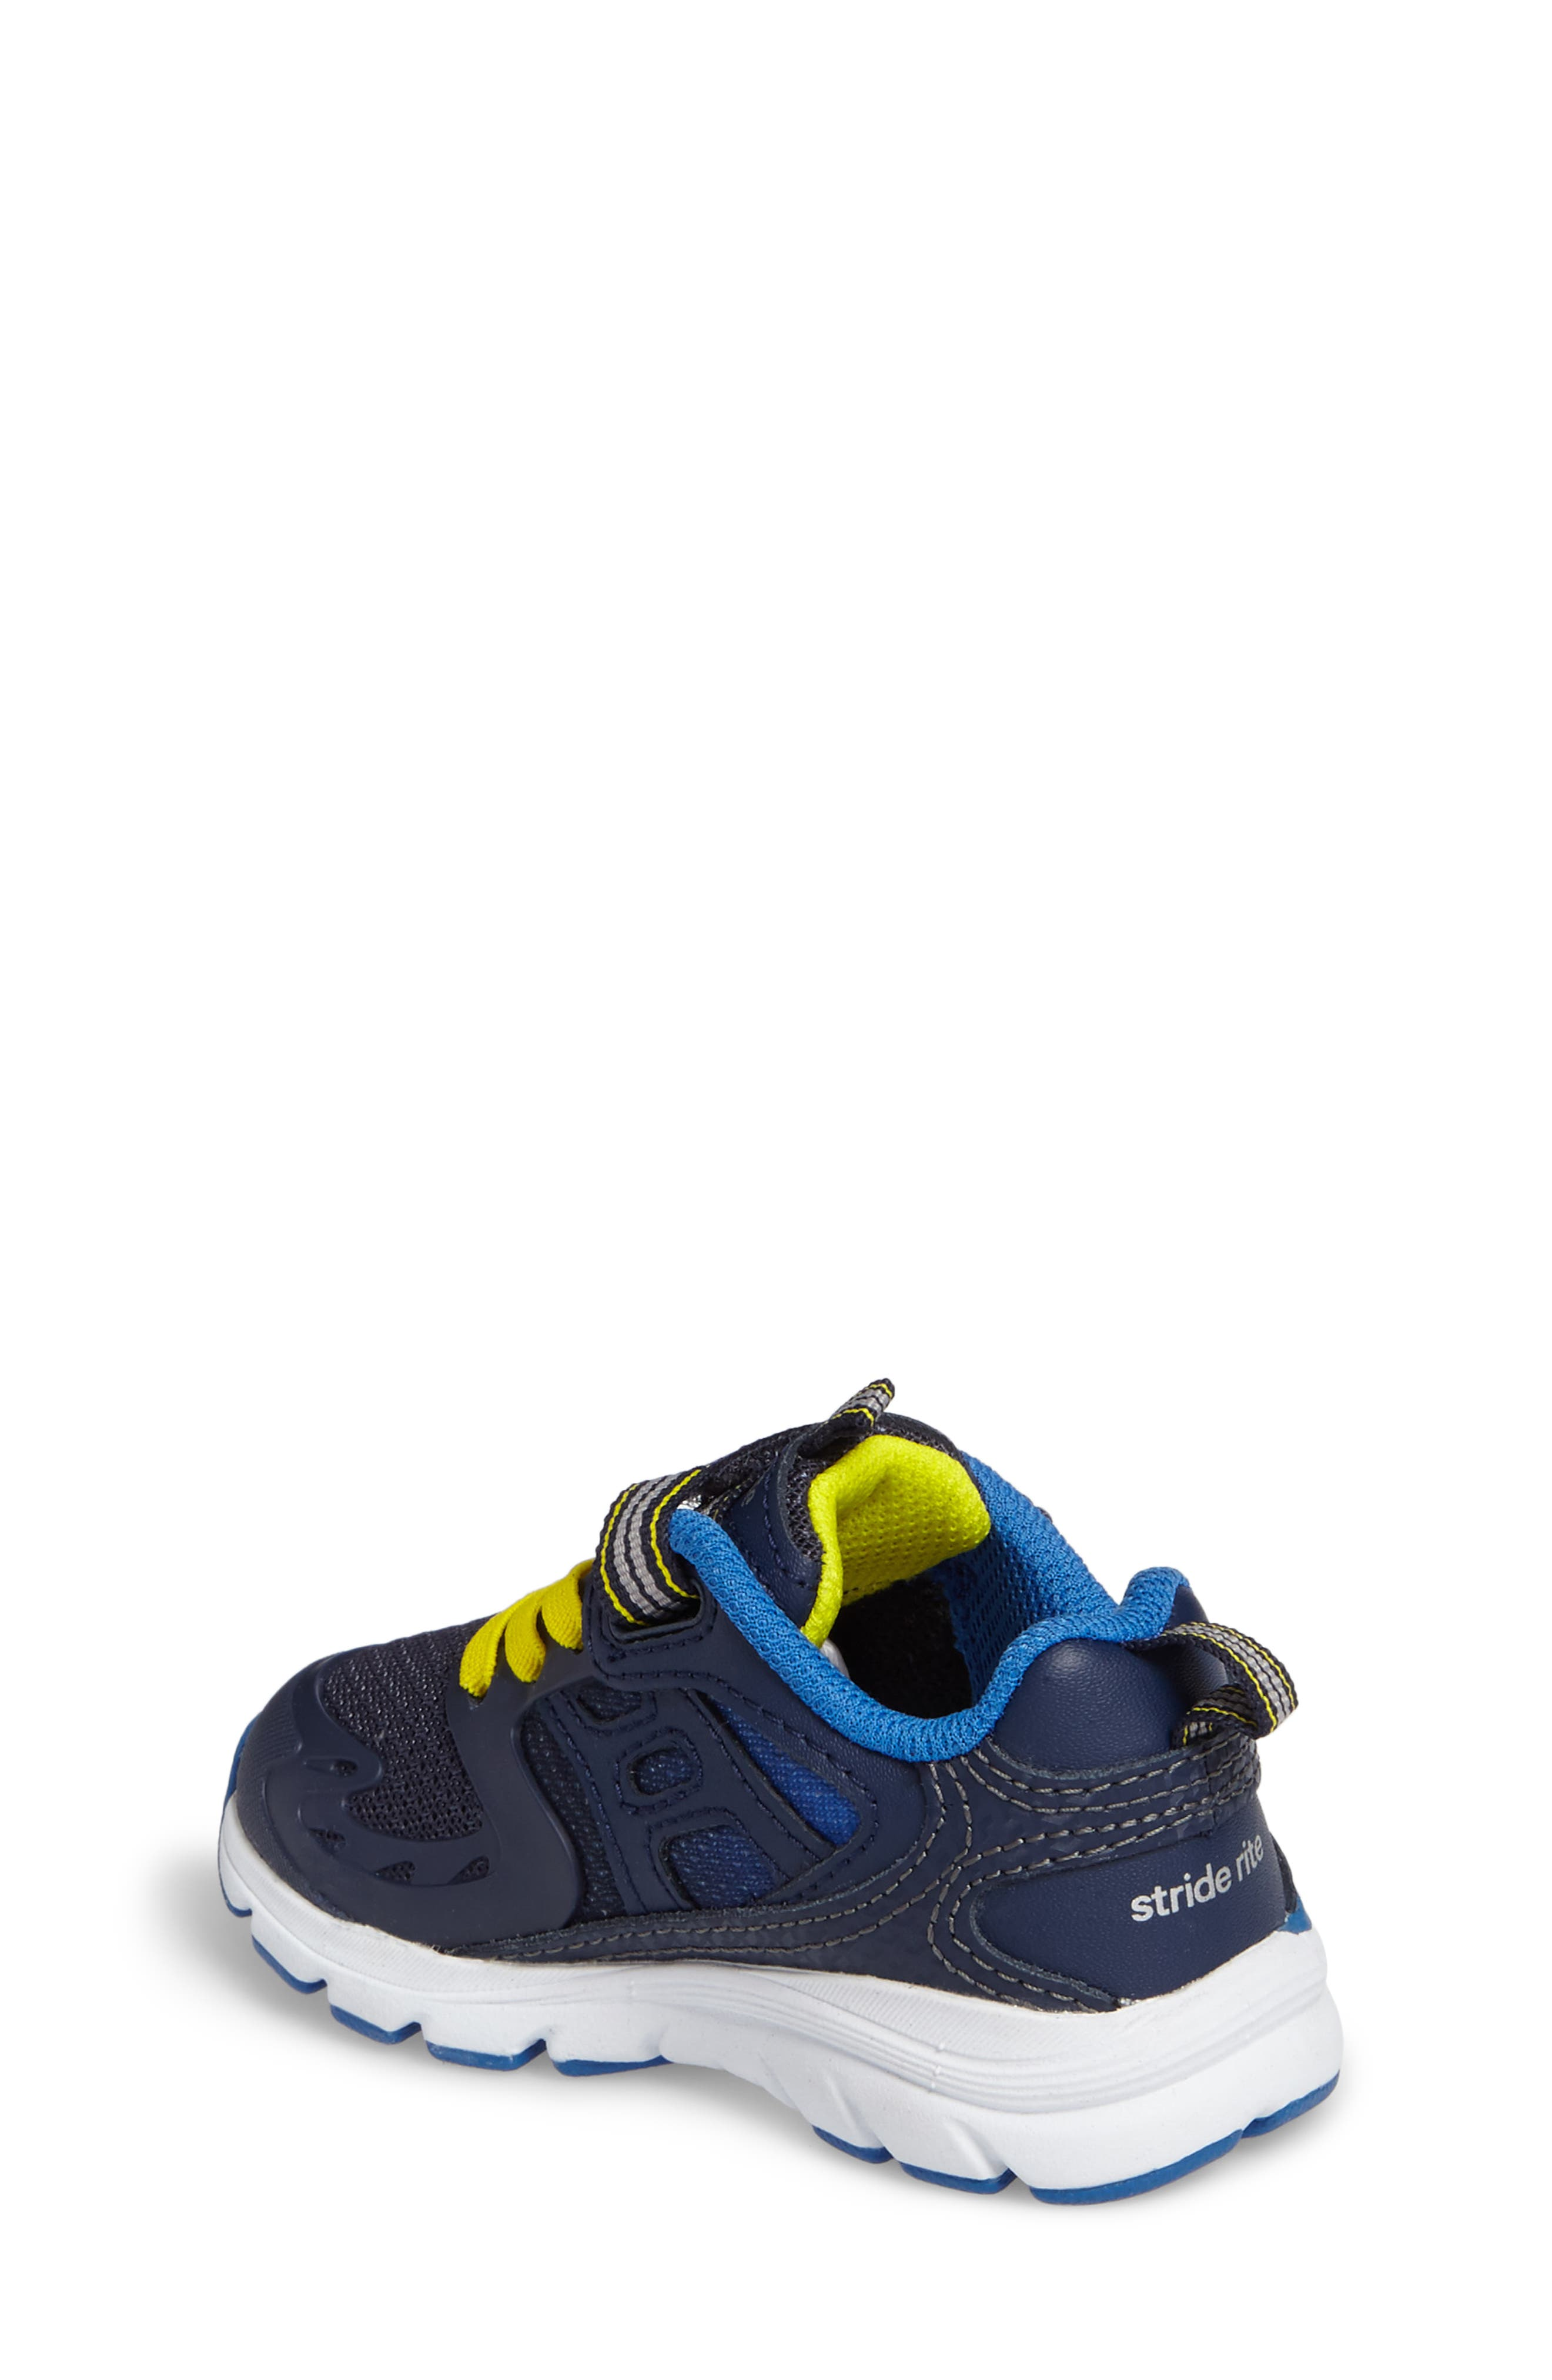 Made 2 Play Breccen Sneaker,                             Alternate thumbnail 2, color,                             Navy